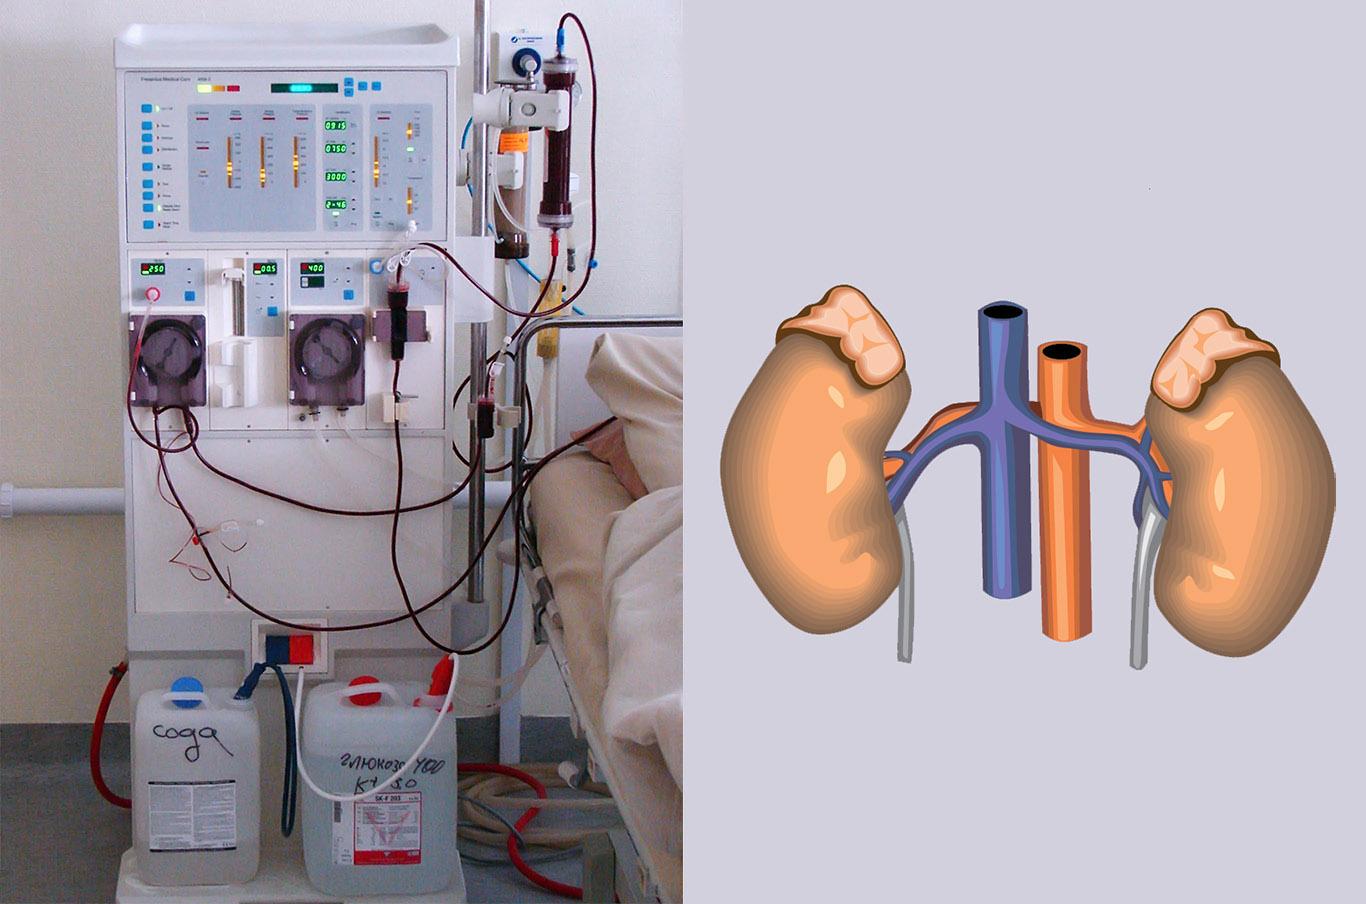 Аппарат гемодиализа в картинке